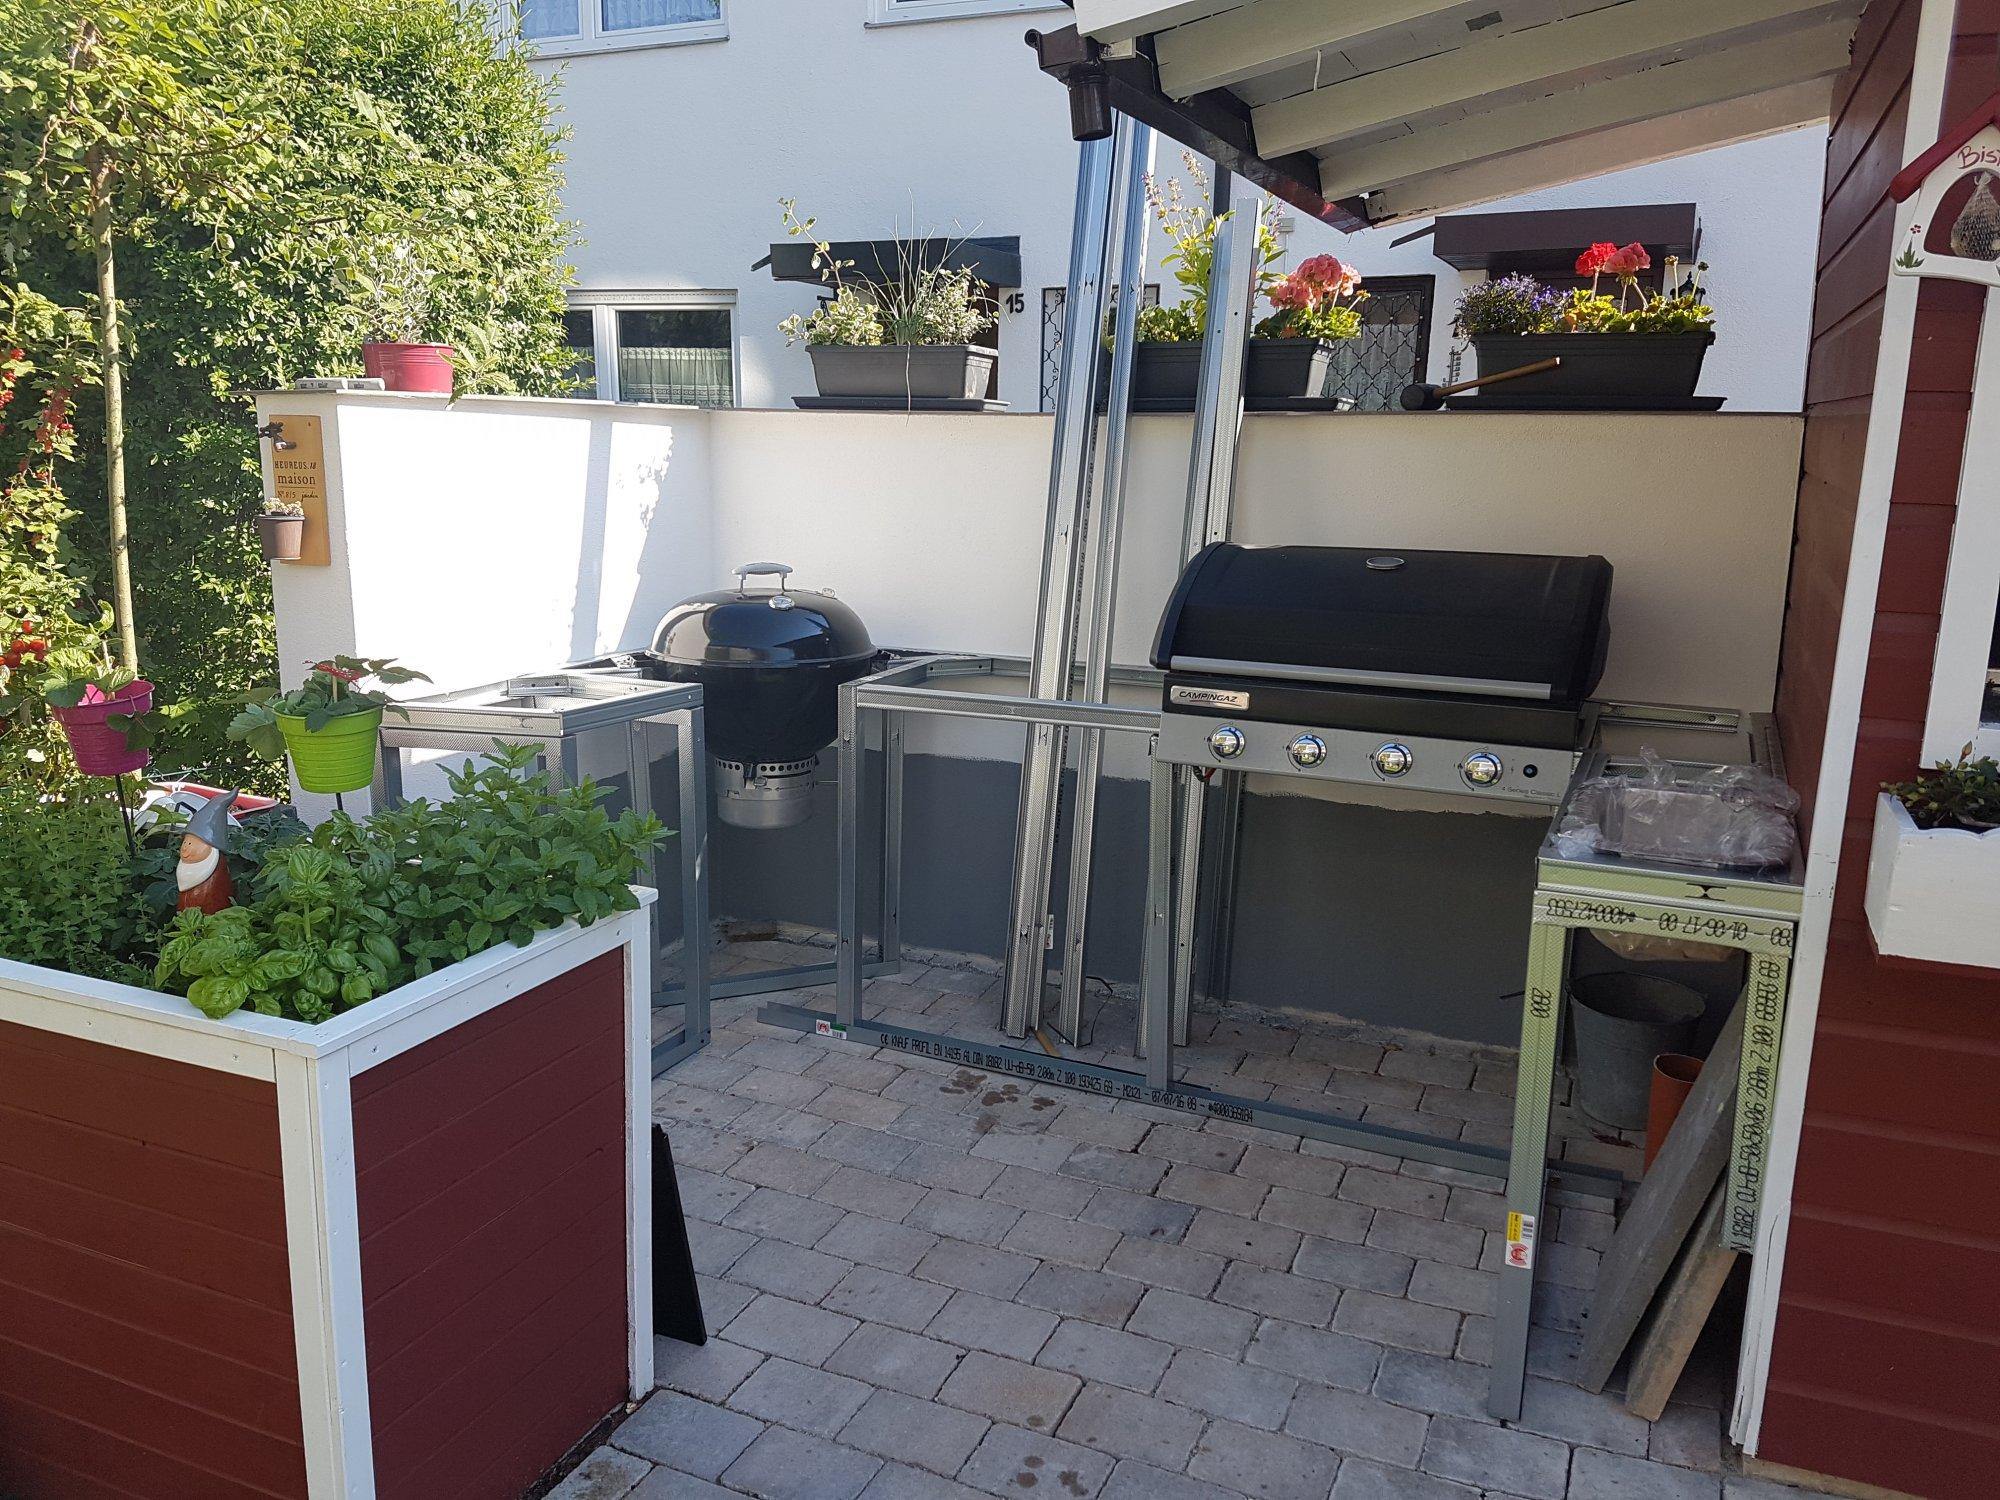 Outdoorküche Garten Obi : Outdoorküche garten obituary outdoorküche garten edelstahl obi